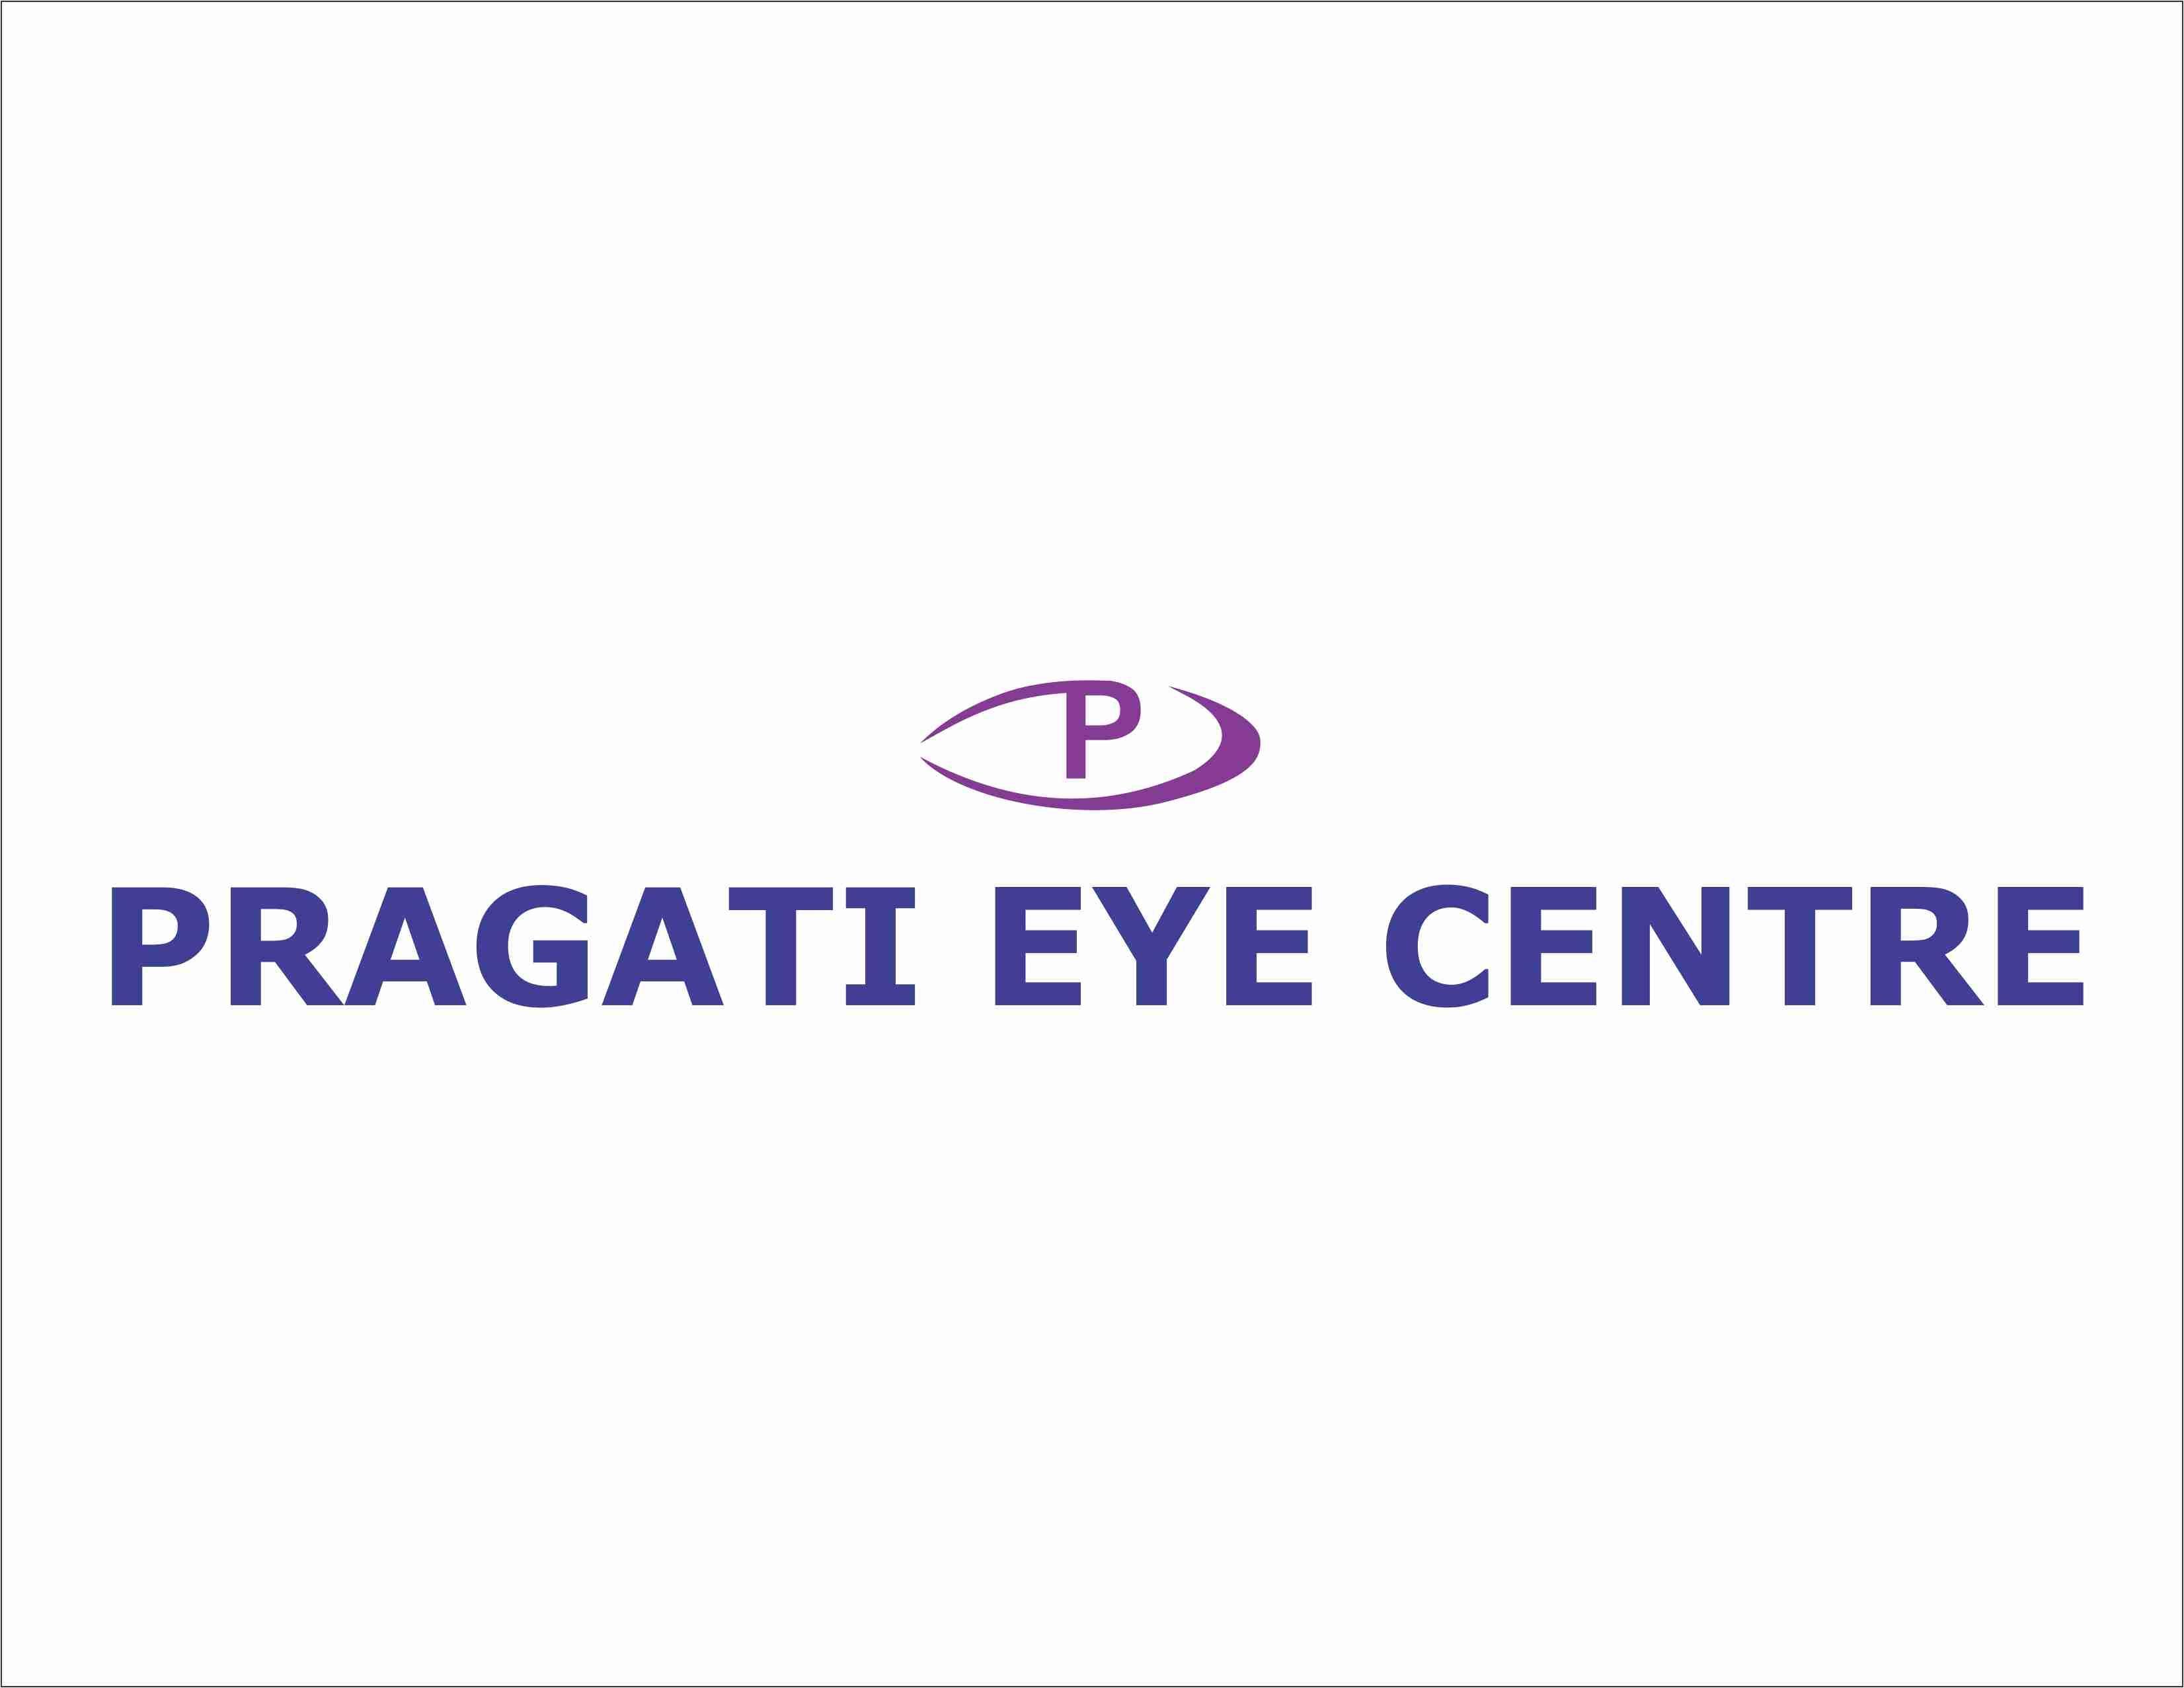 Pragati Eye Centre